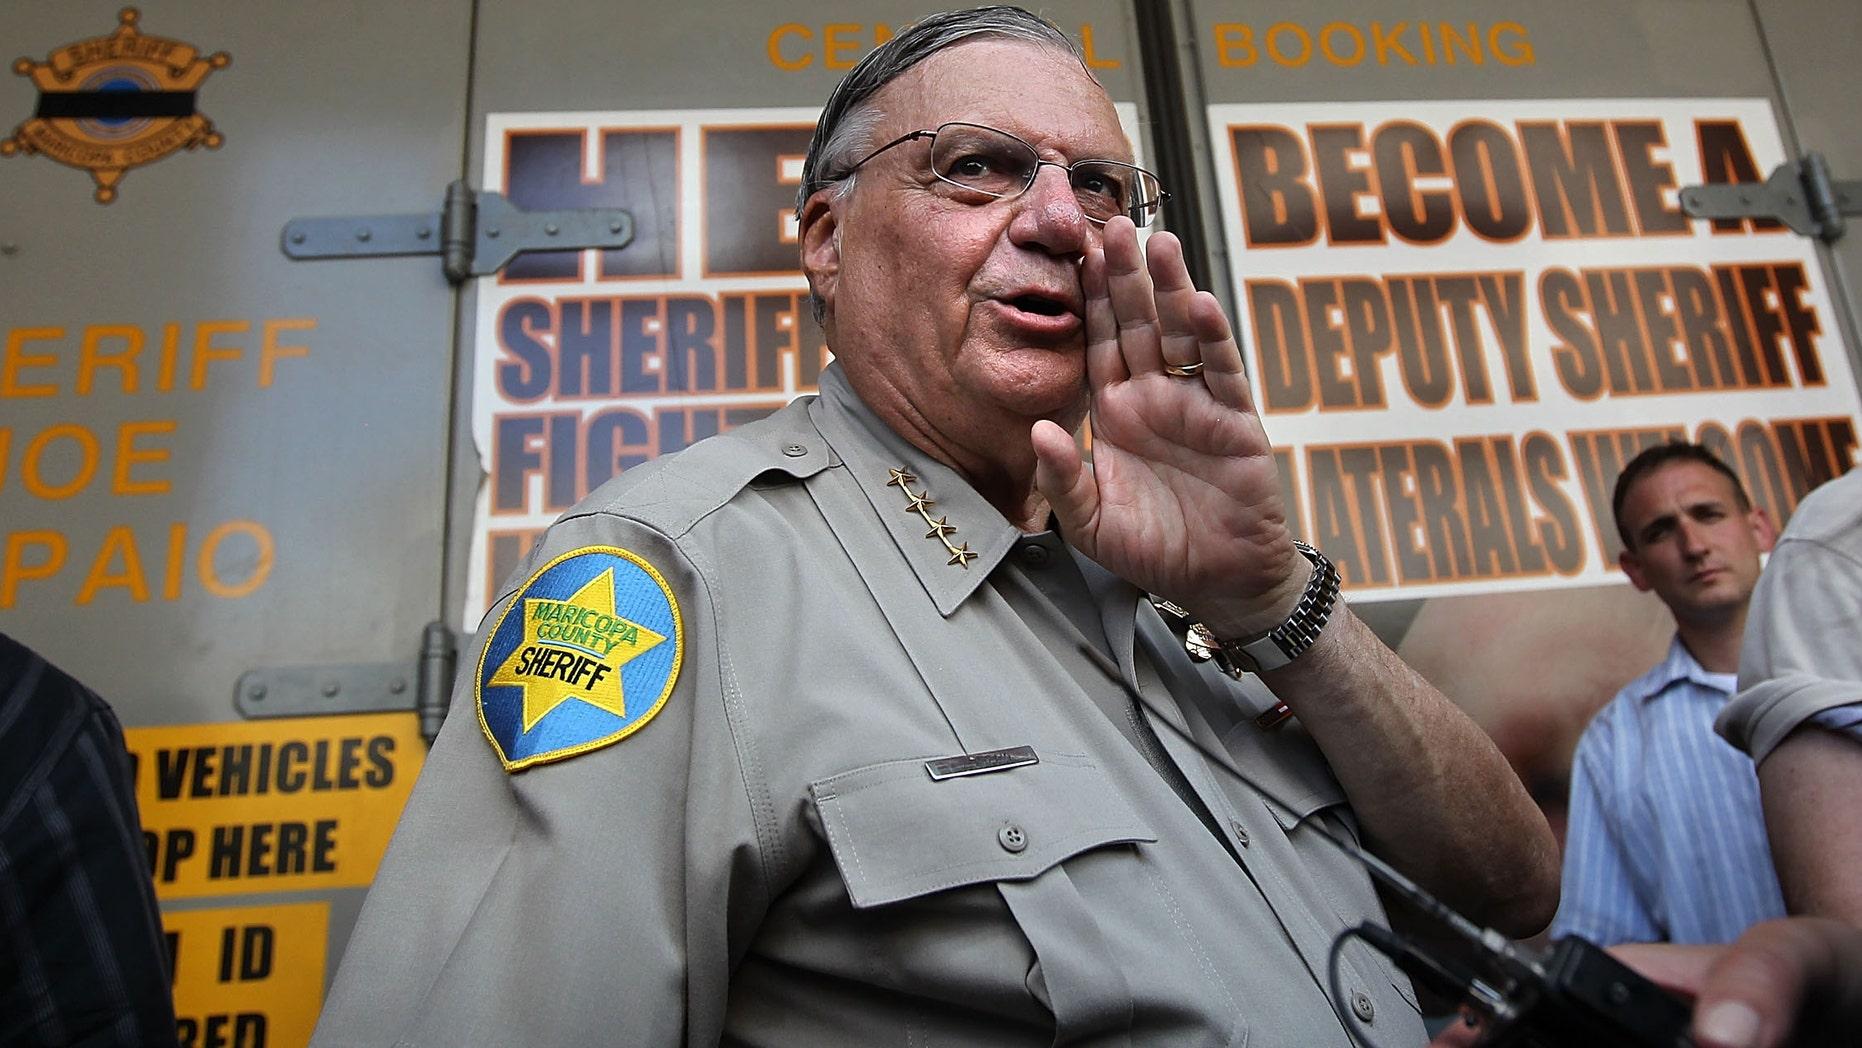 Maricopa County Sheriff Joe Arpaio in a 2010 file photo.